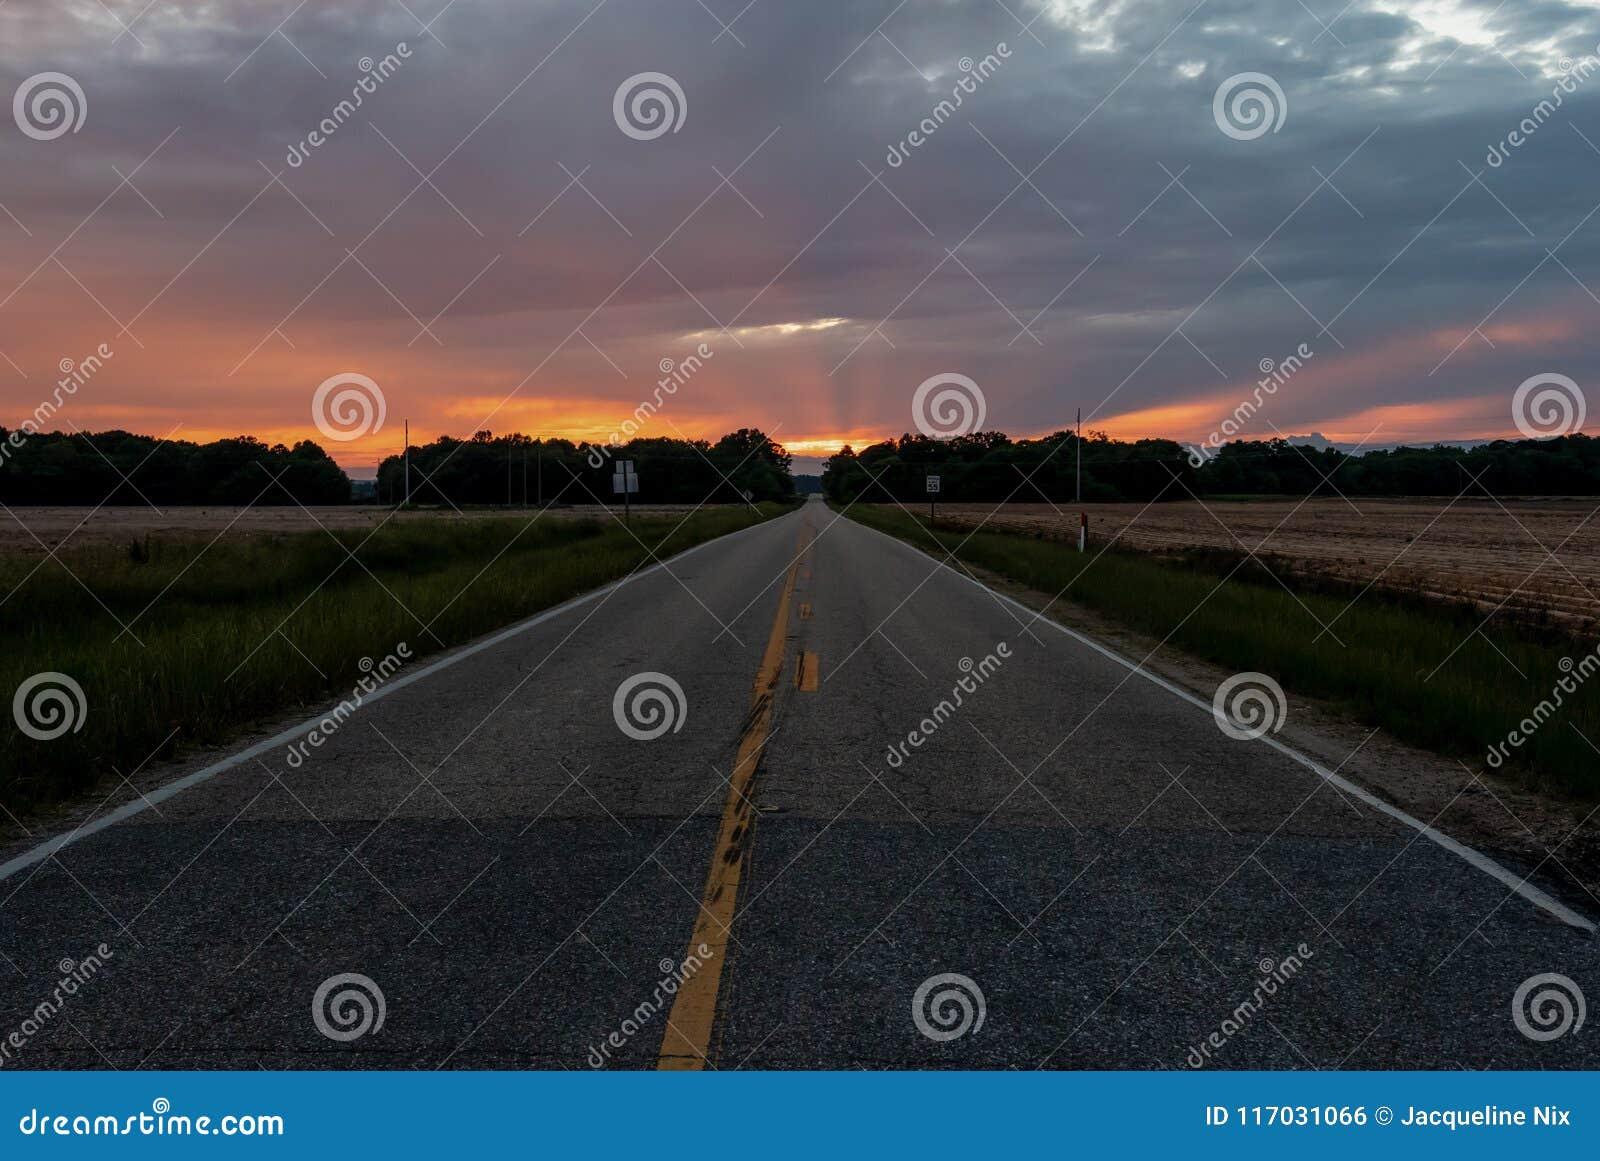 Estrada que conduz ao por do sol